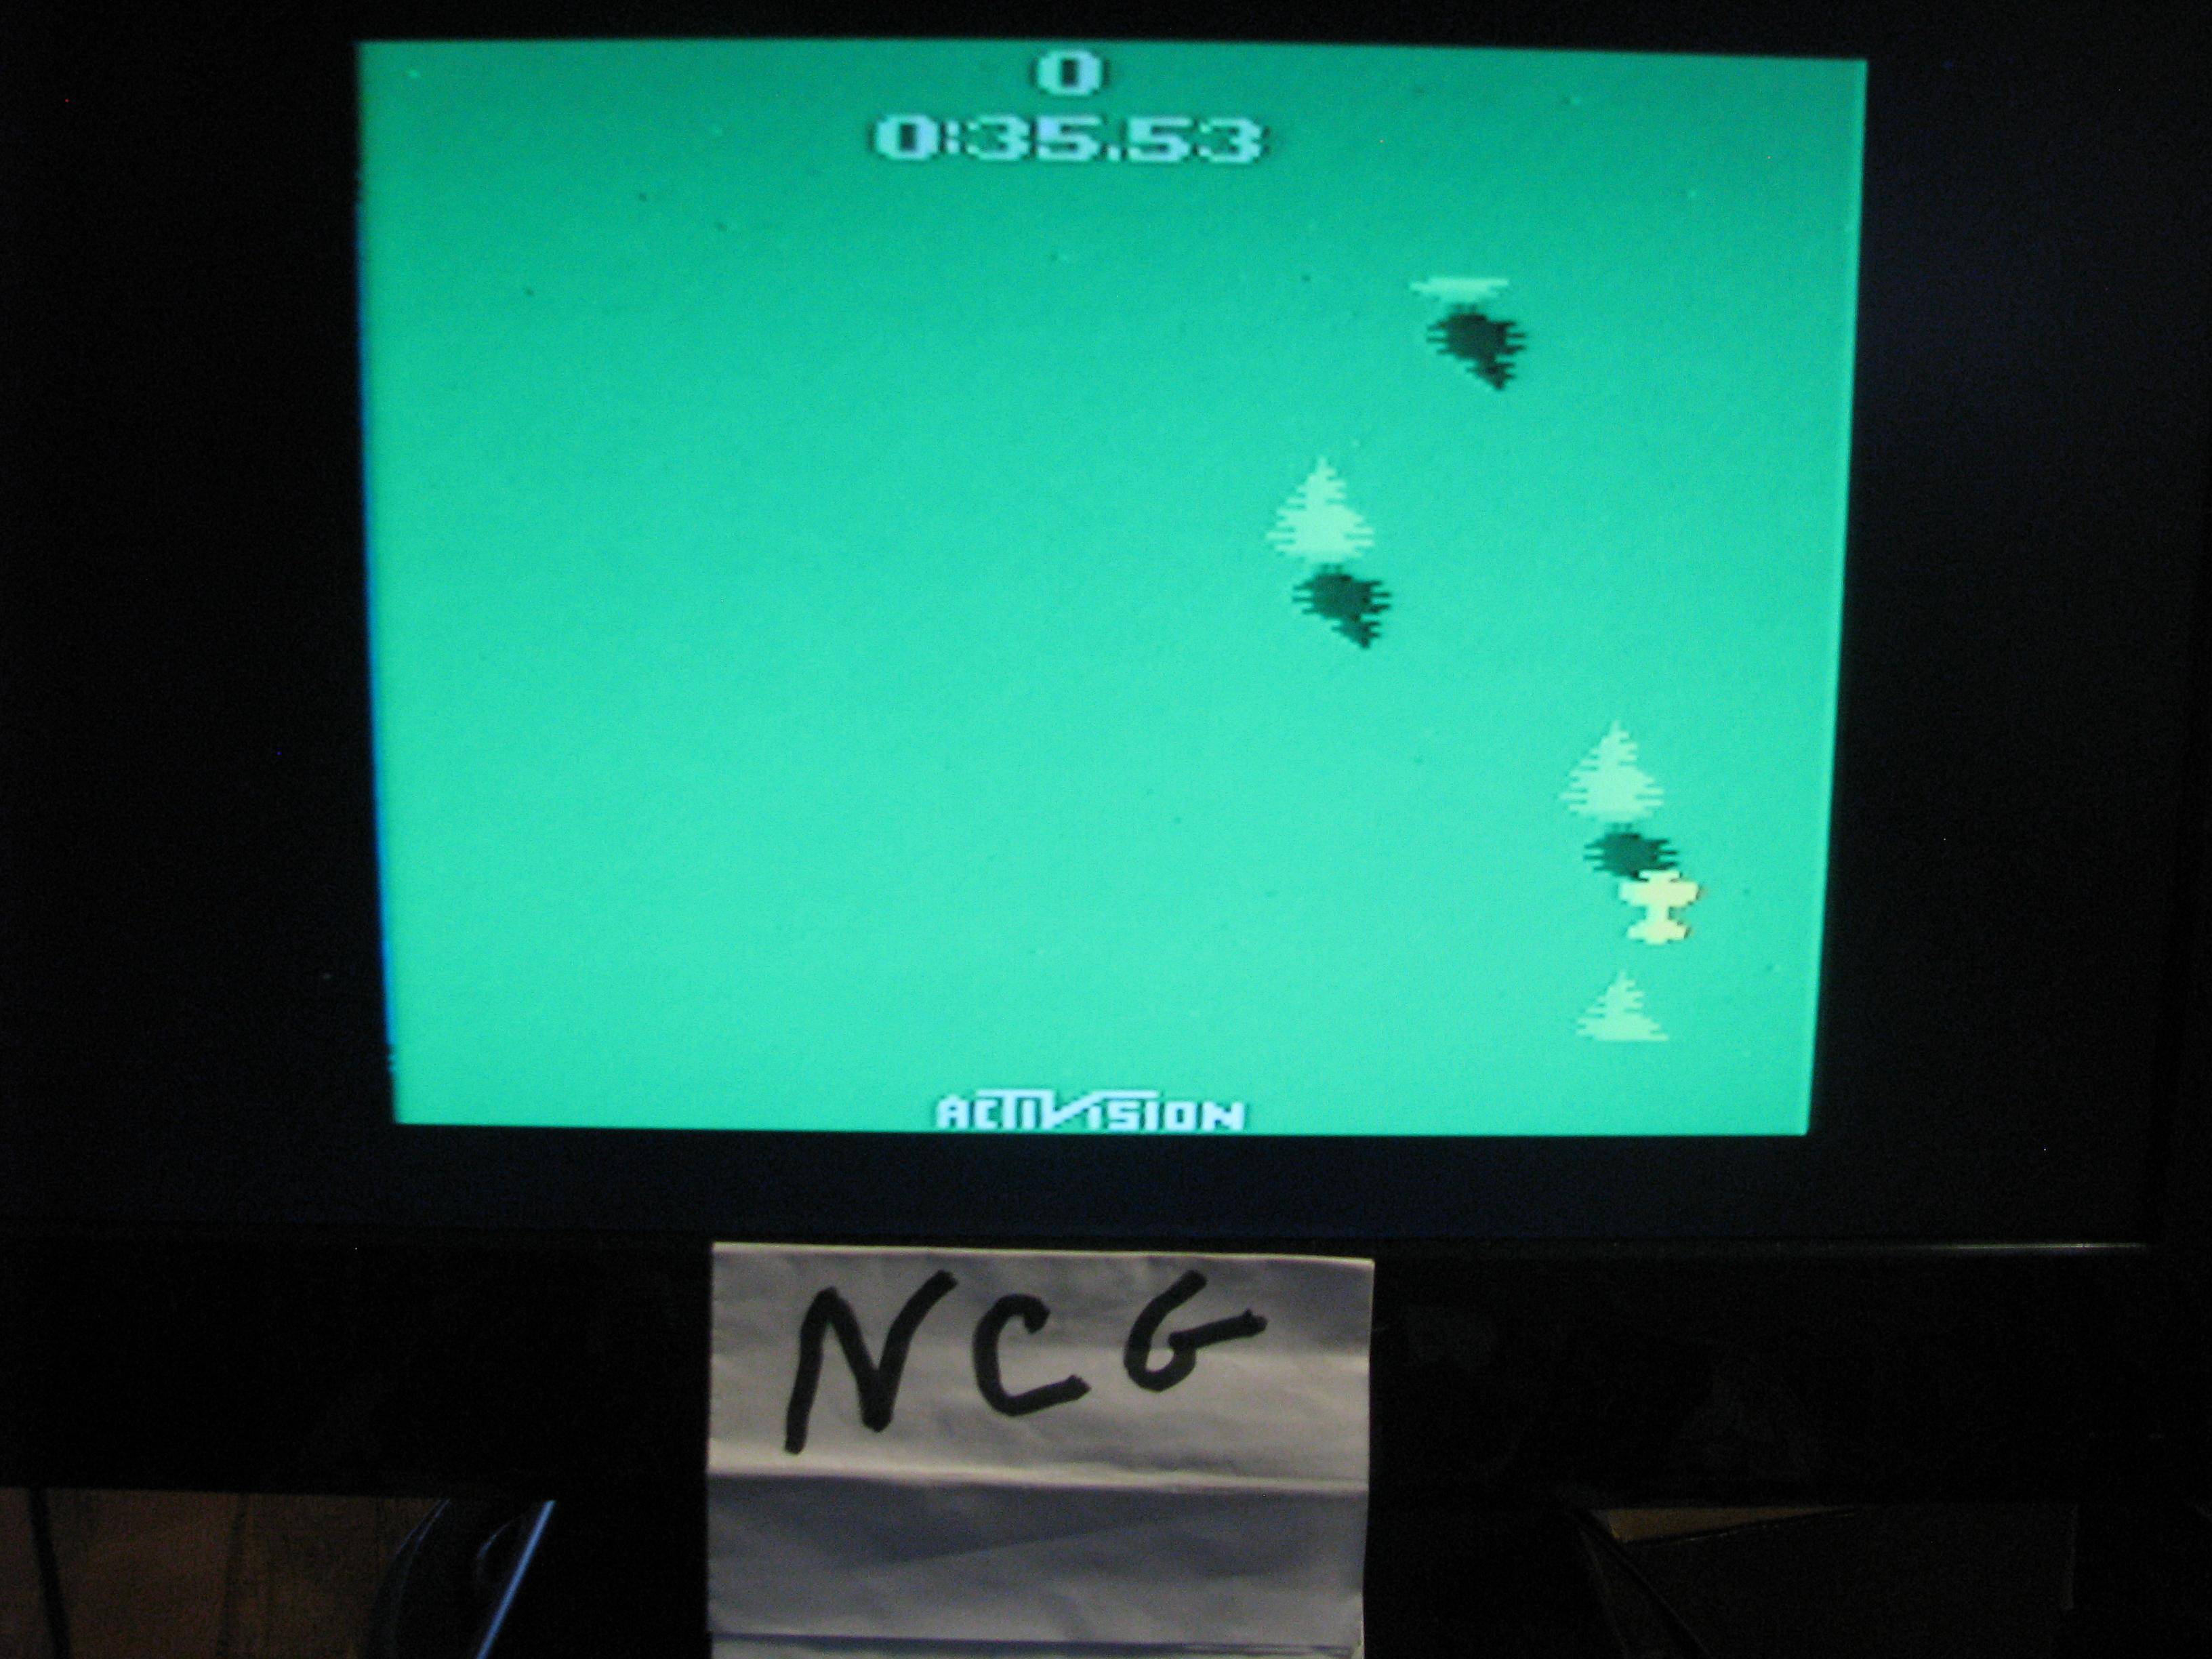 NorthCoastGamer: Sky Jinks (Atari 2600 Expert/A) 0:00:35.53 points on 2015-01-16 16:09:46